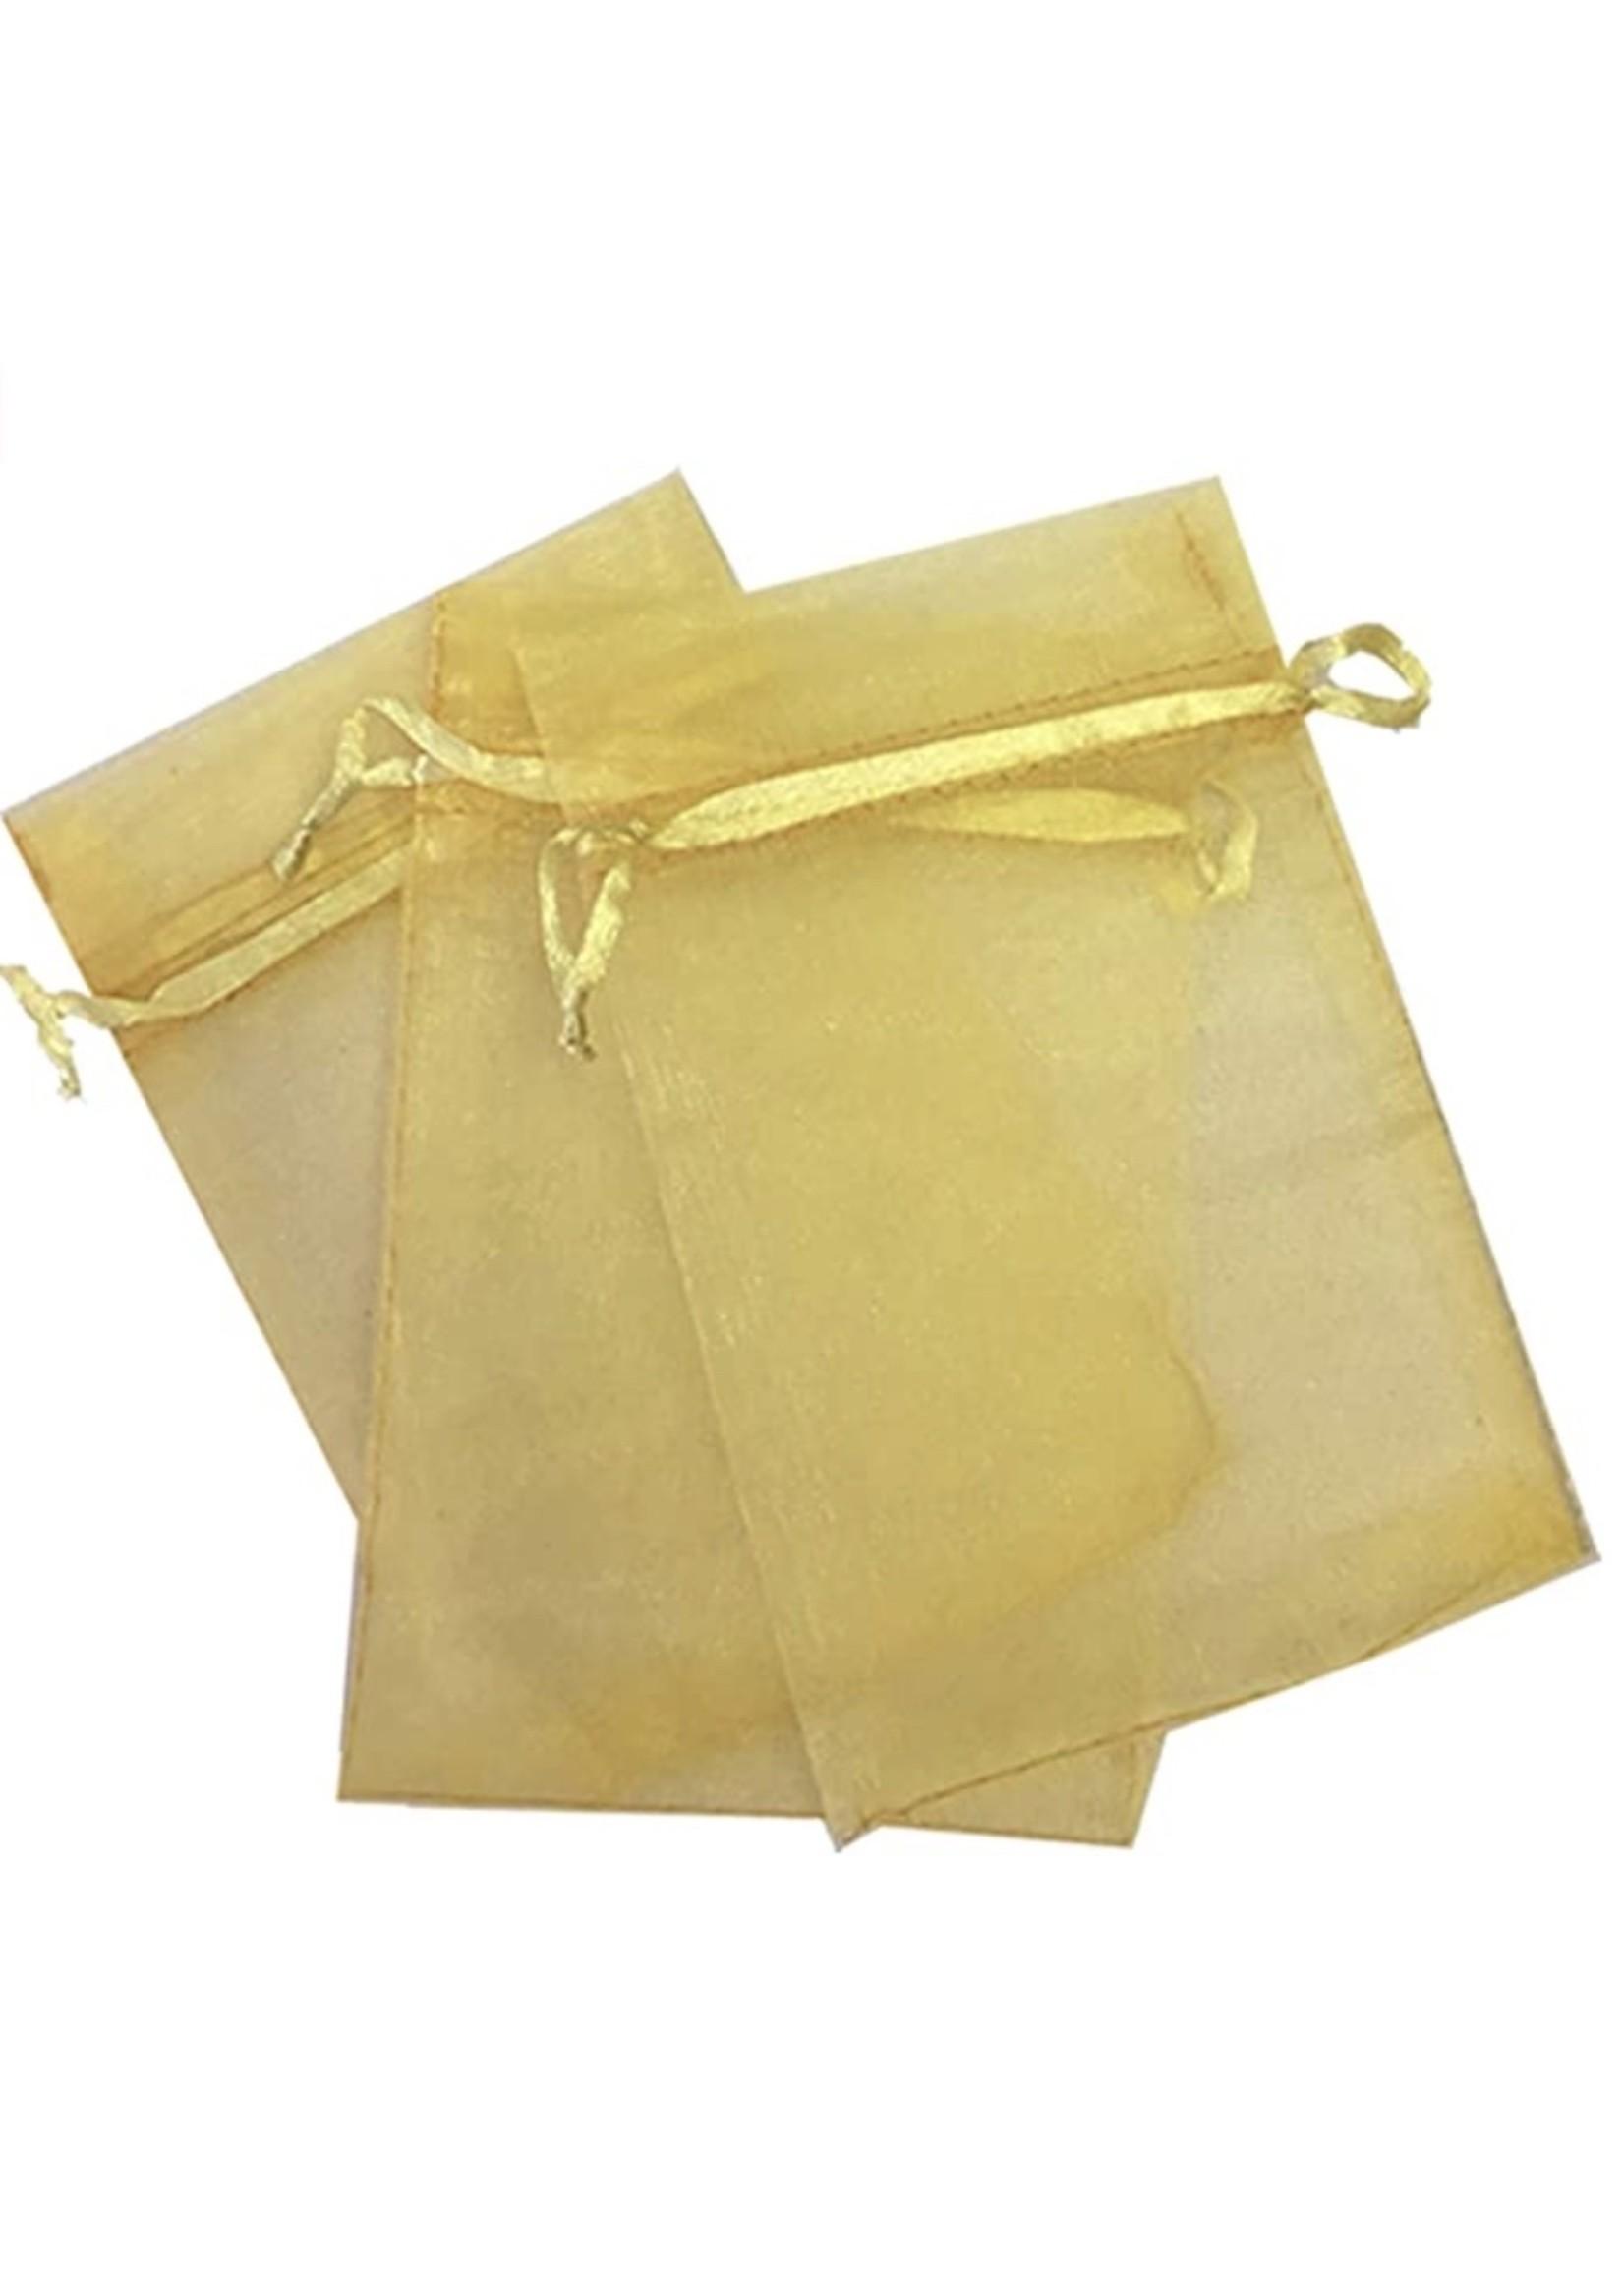 Gold Organza Bags - Box of 5000